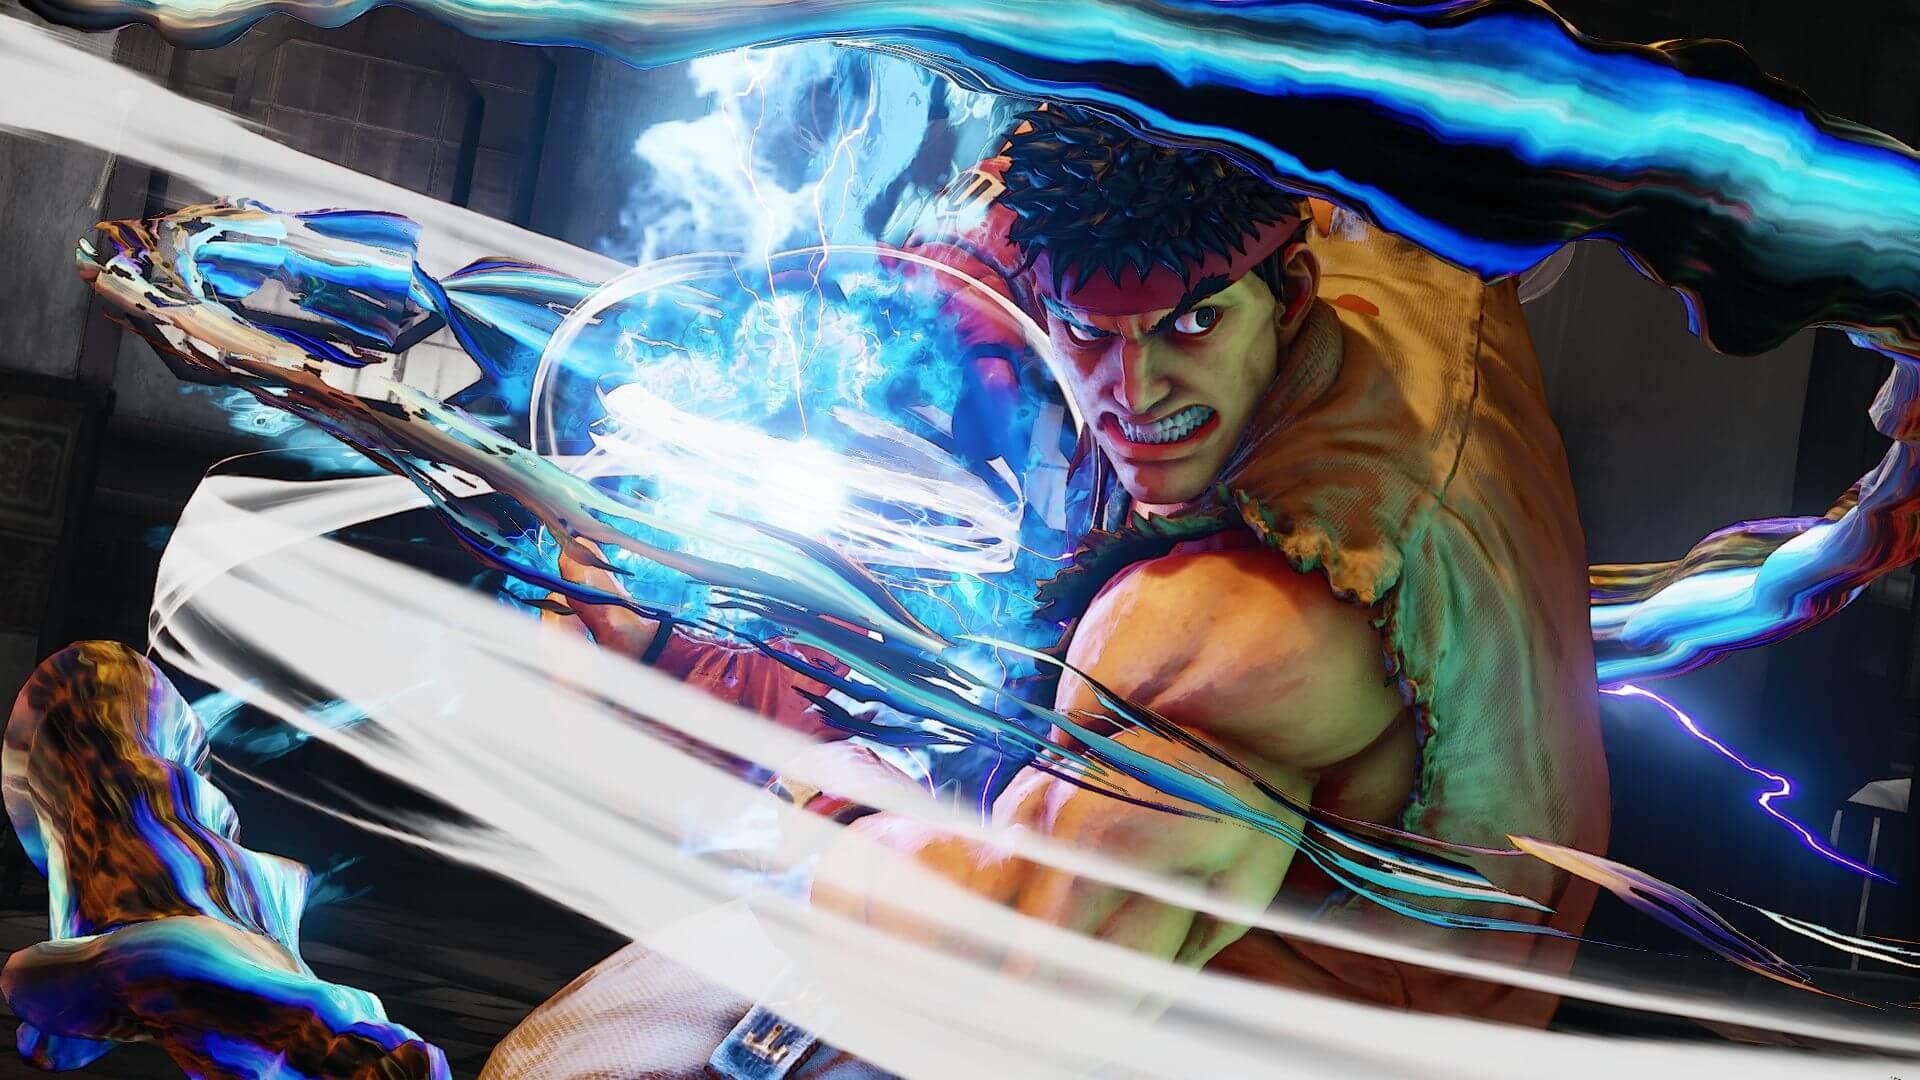 Street Fighter 2 CE - Free Online Game Street Fighter Flash - Online game MoFunZone Play Super Nintendo snes games - emulator